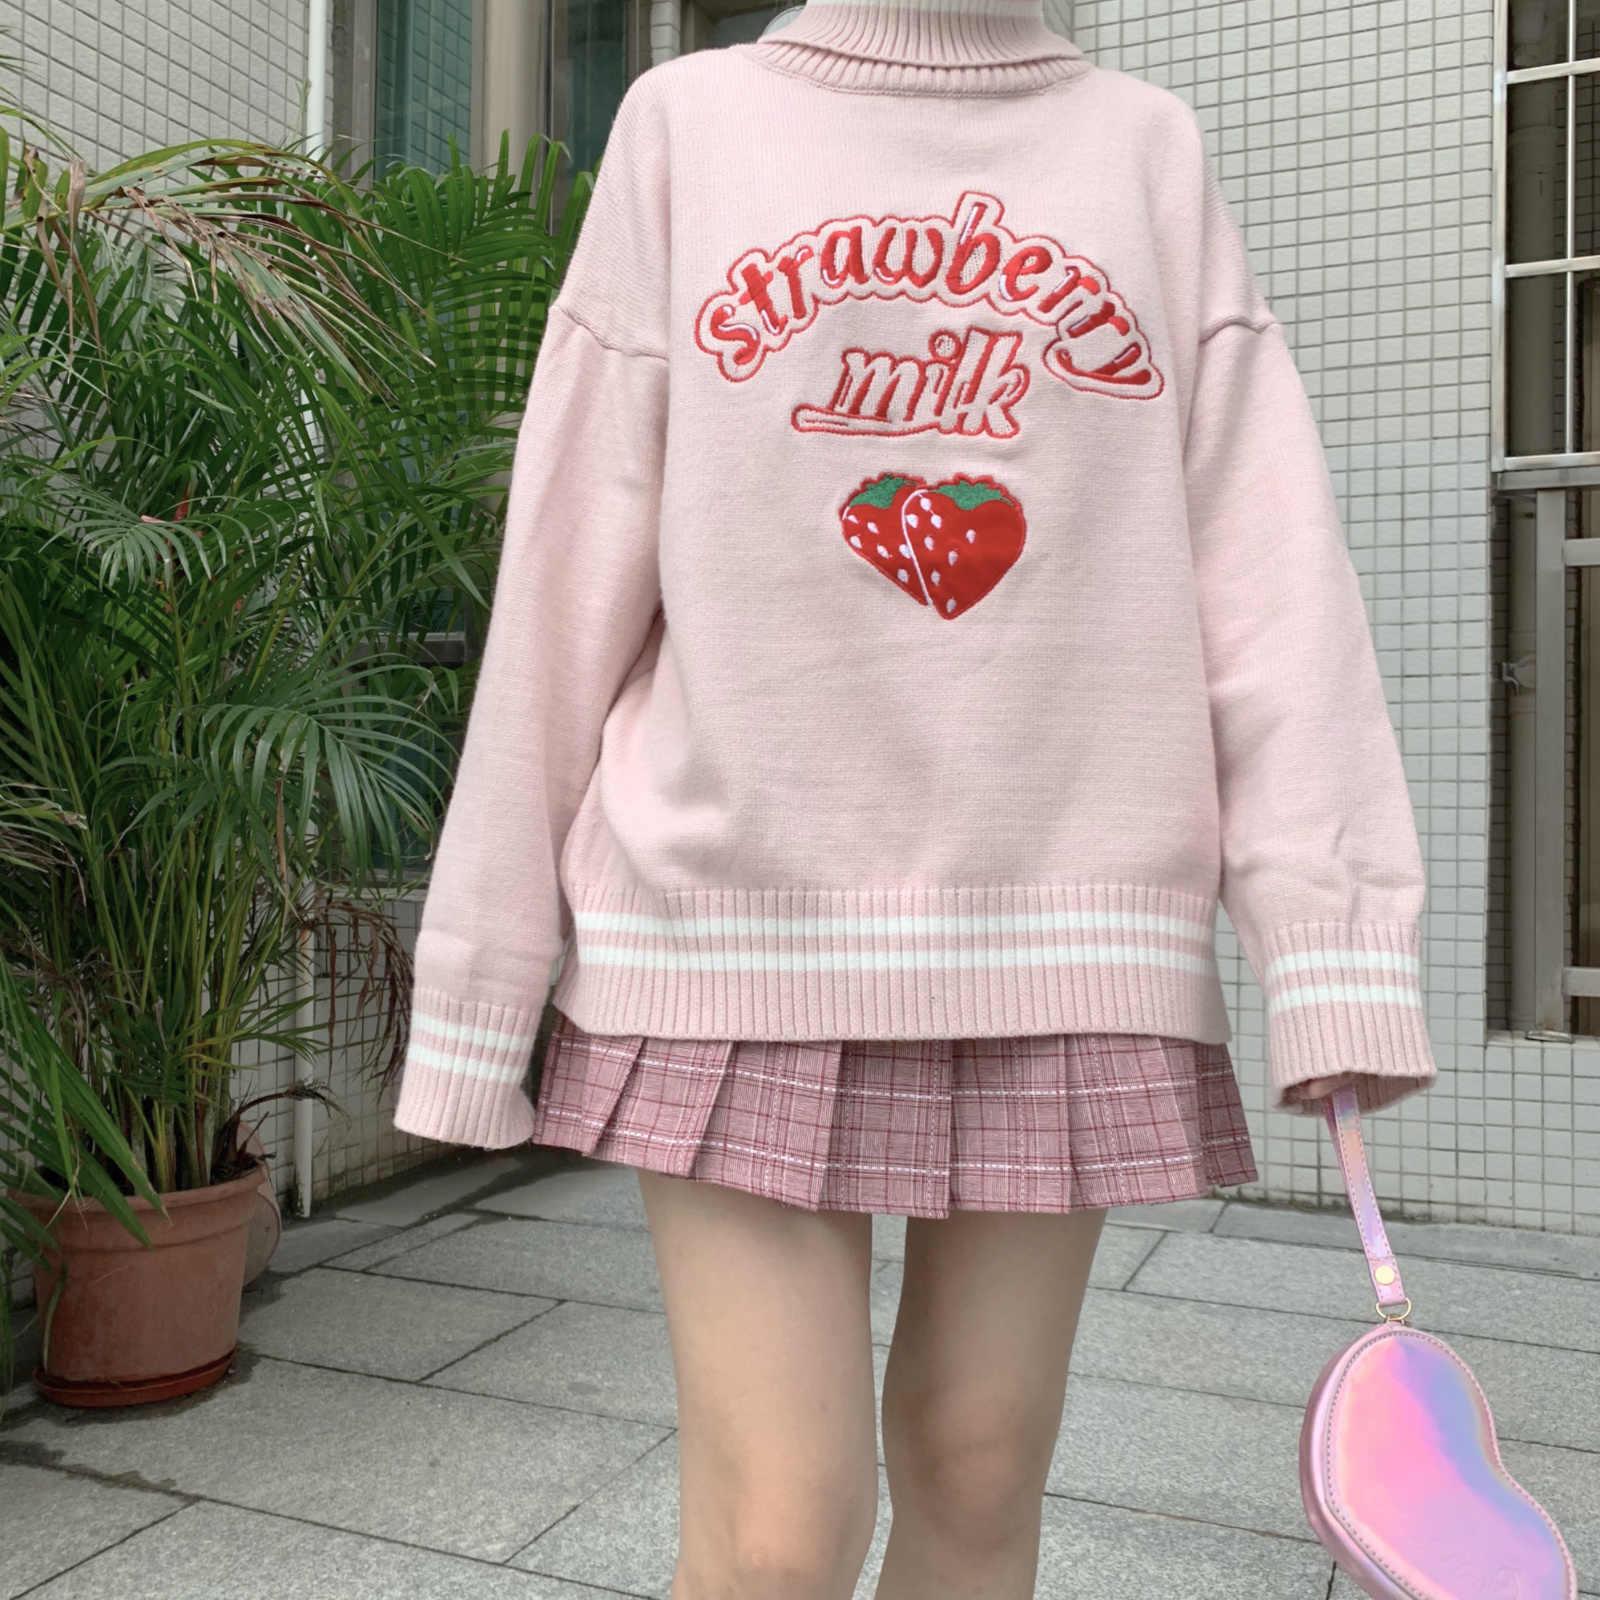 ae5ba490f89 Japanese Women Vintage Sweater Turtleneck Cute Strawberry Milk Knitted  Pullovers Harajuku Teen Girl Pink Kawaii Jumper Clothing